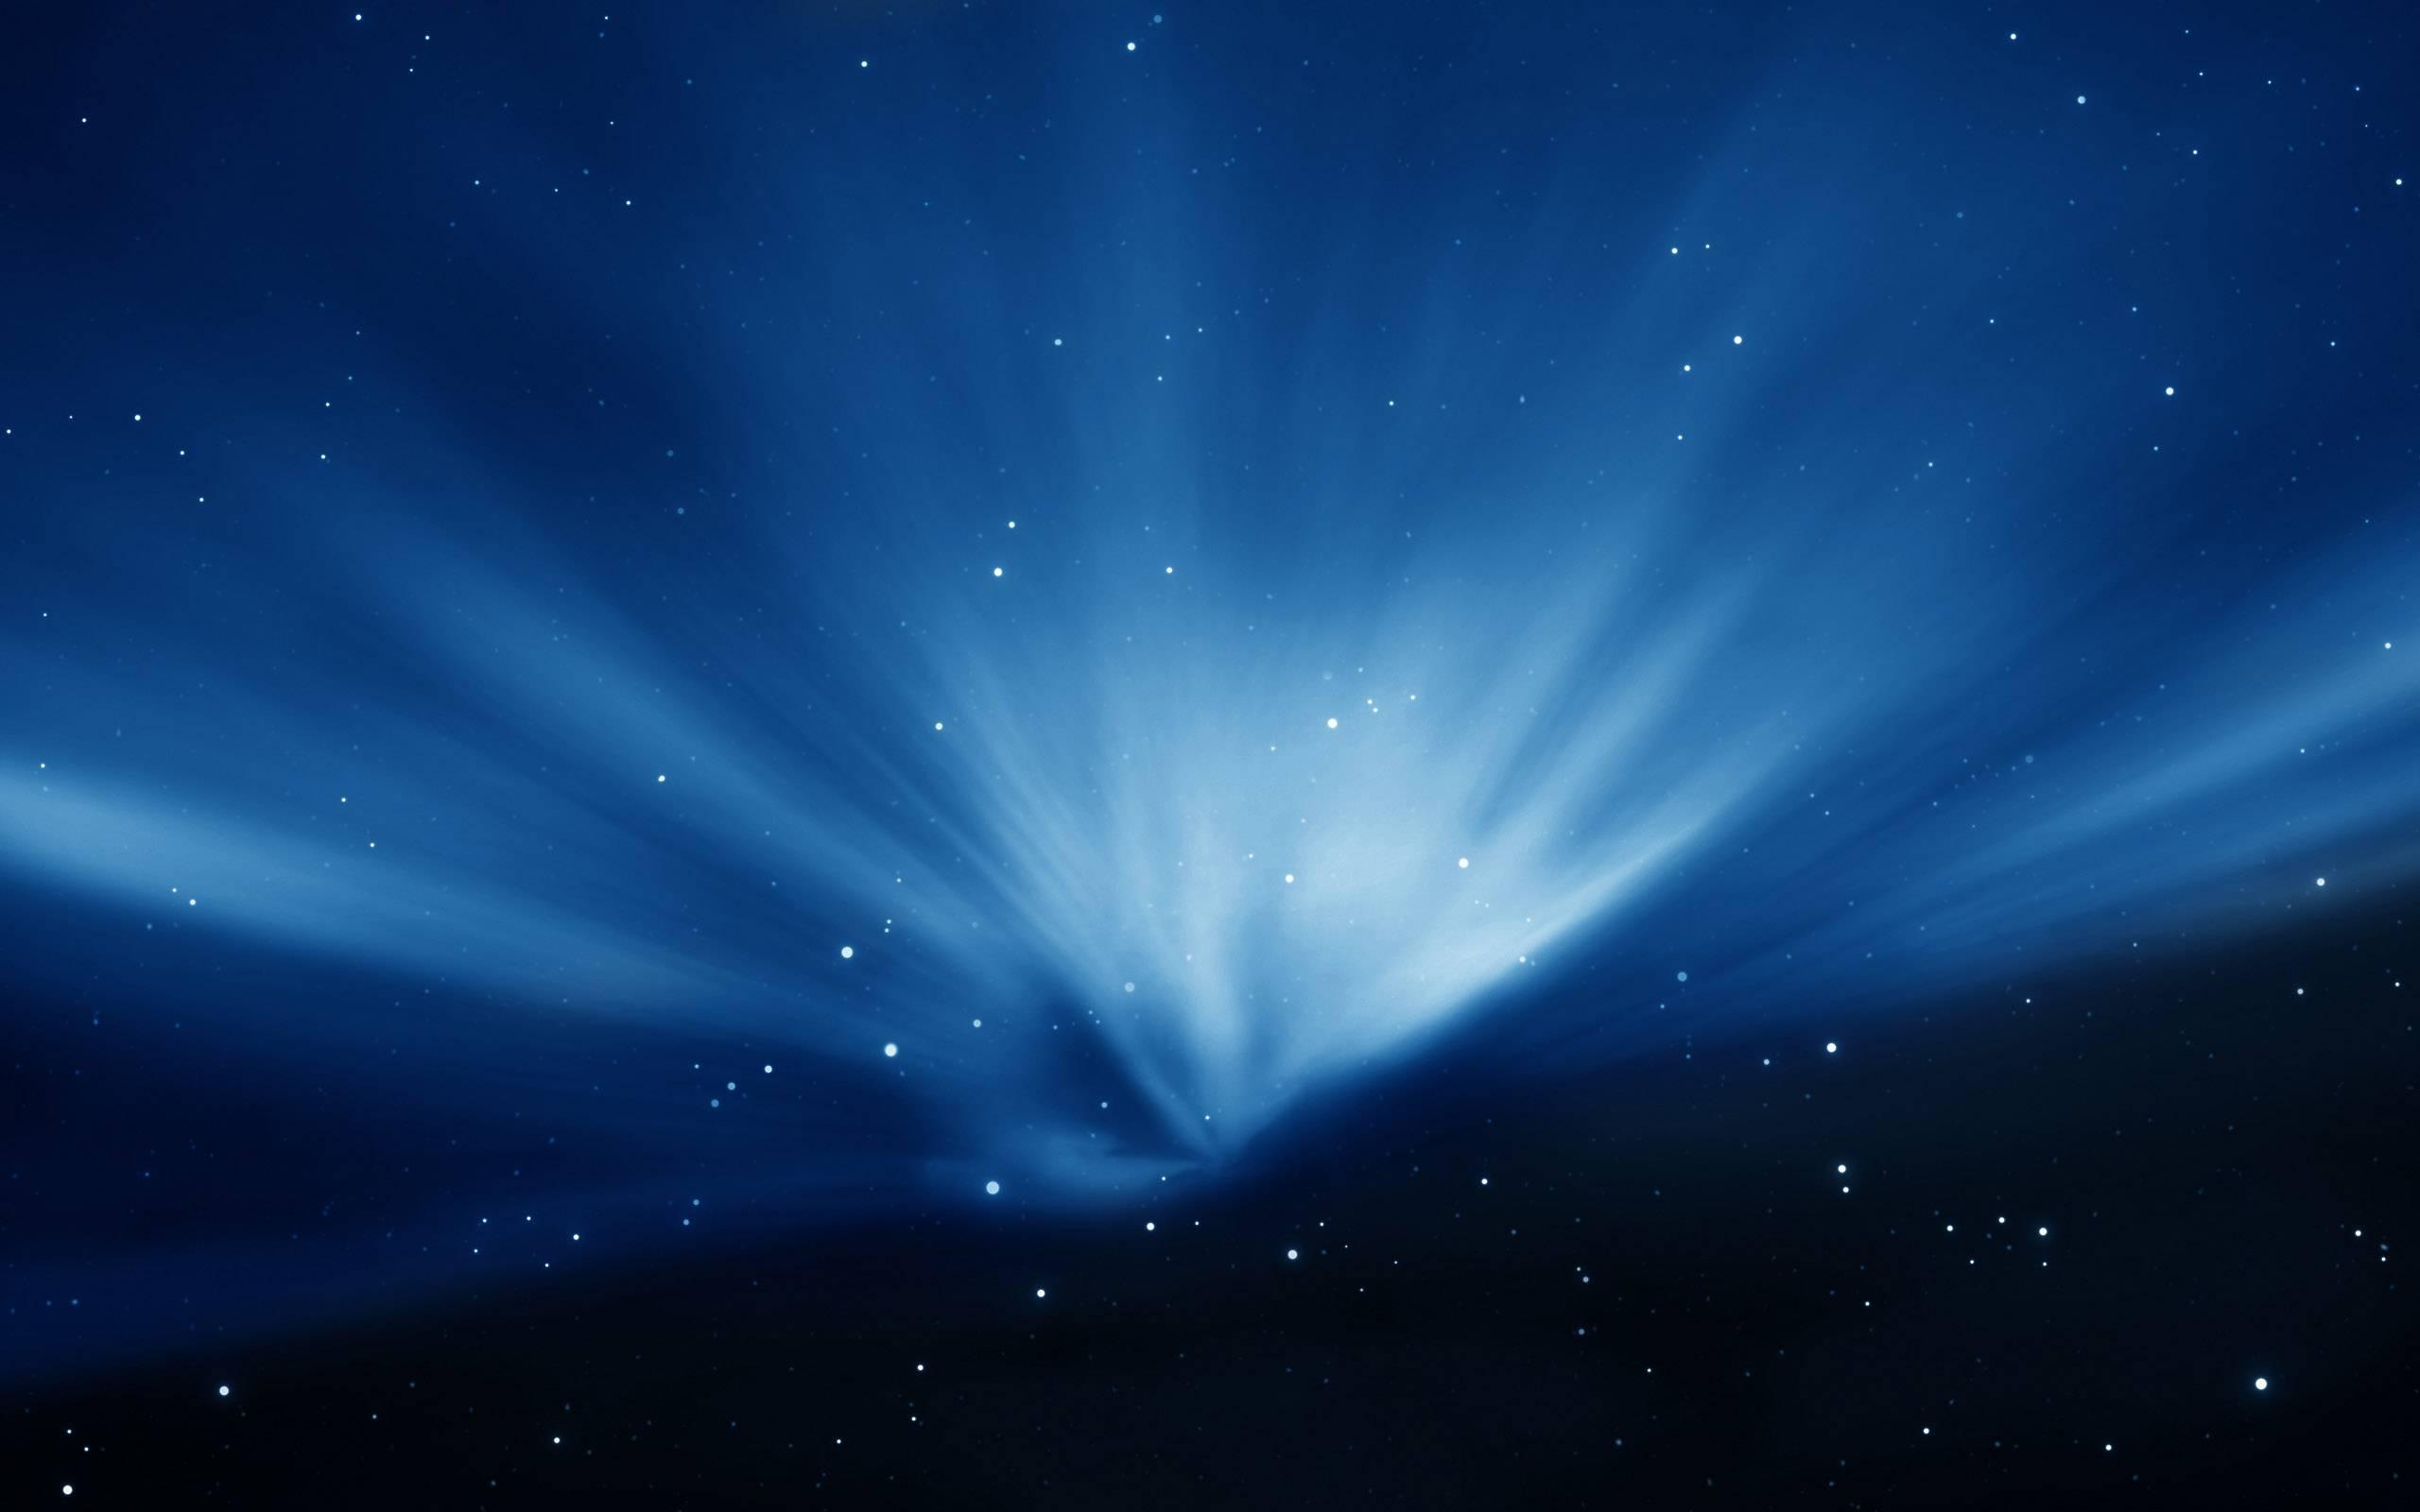 contentuploads201405blue space stars universe verse wallpaperjpg 2560x1600